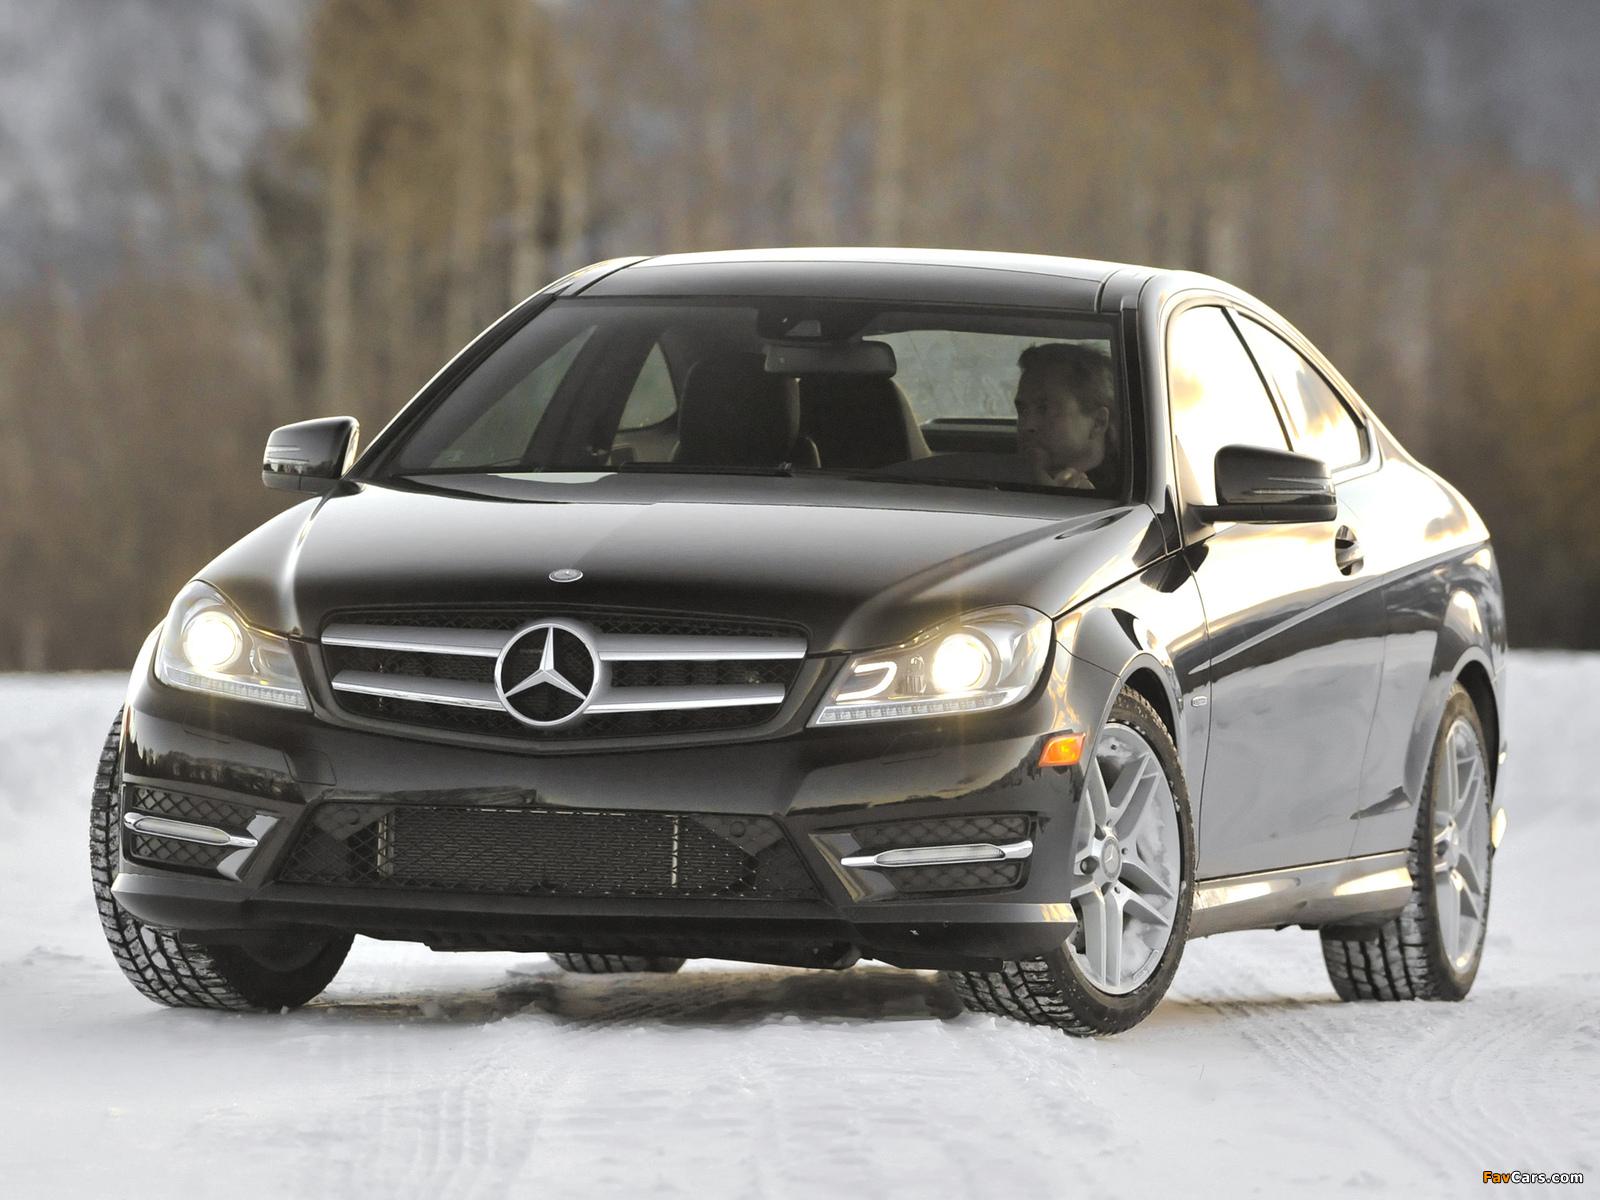 Mercedes-Benz C 350 4MATIC Coupe US-spec (C204) 2011 wallpapers (1600 x 1200)